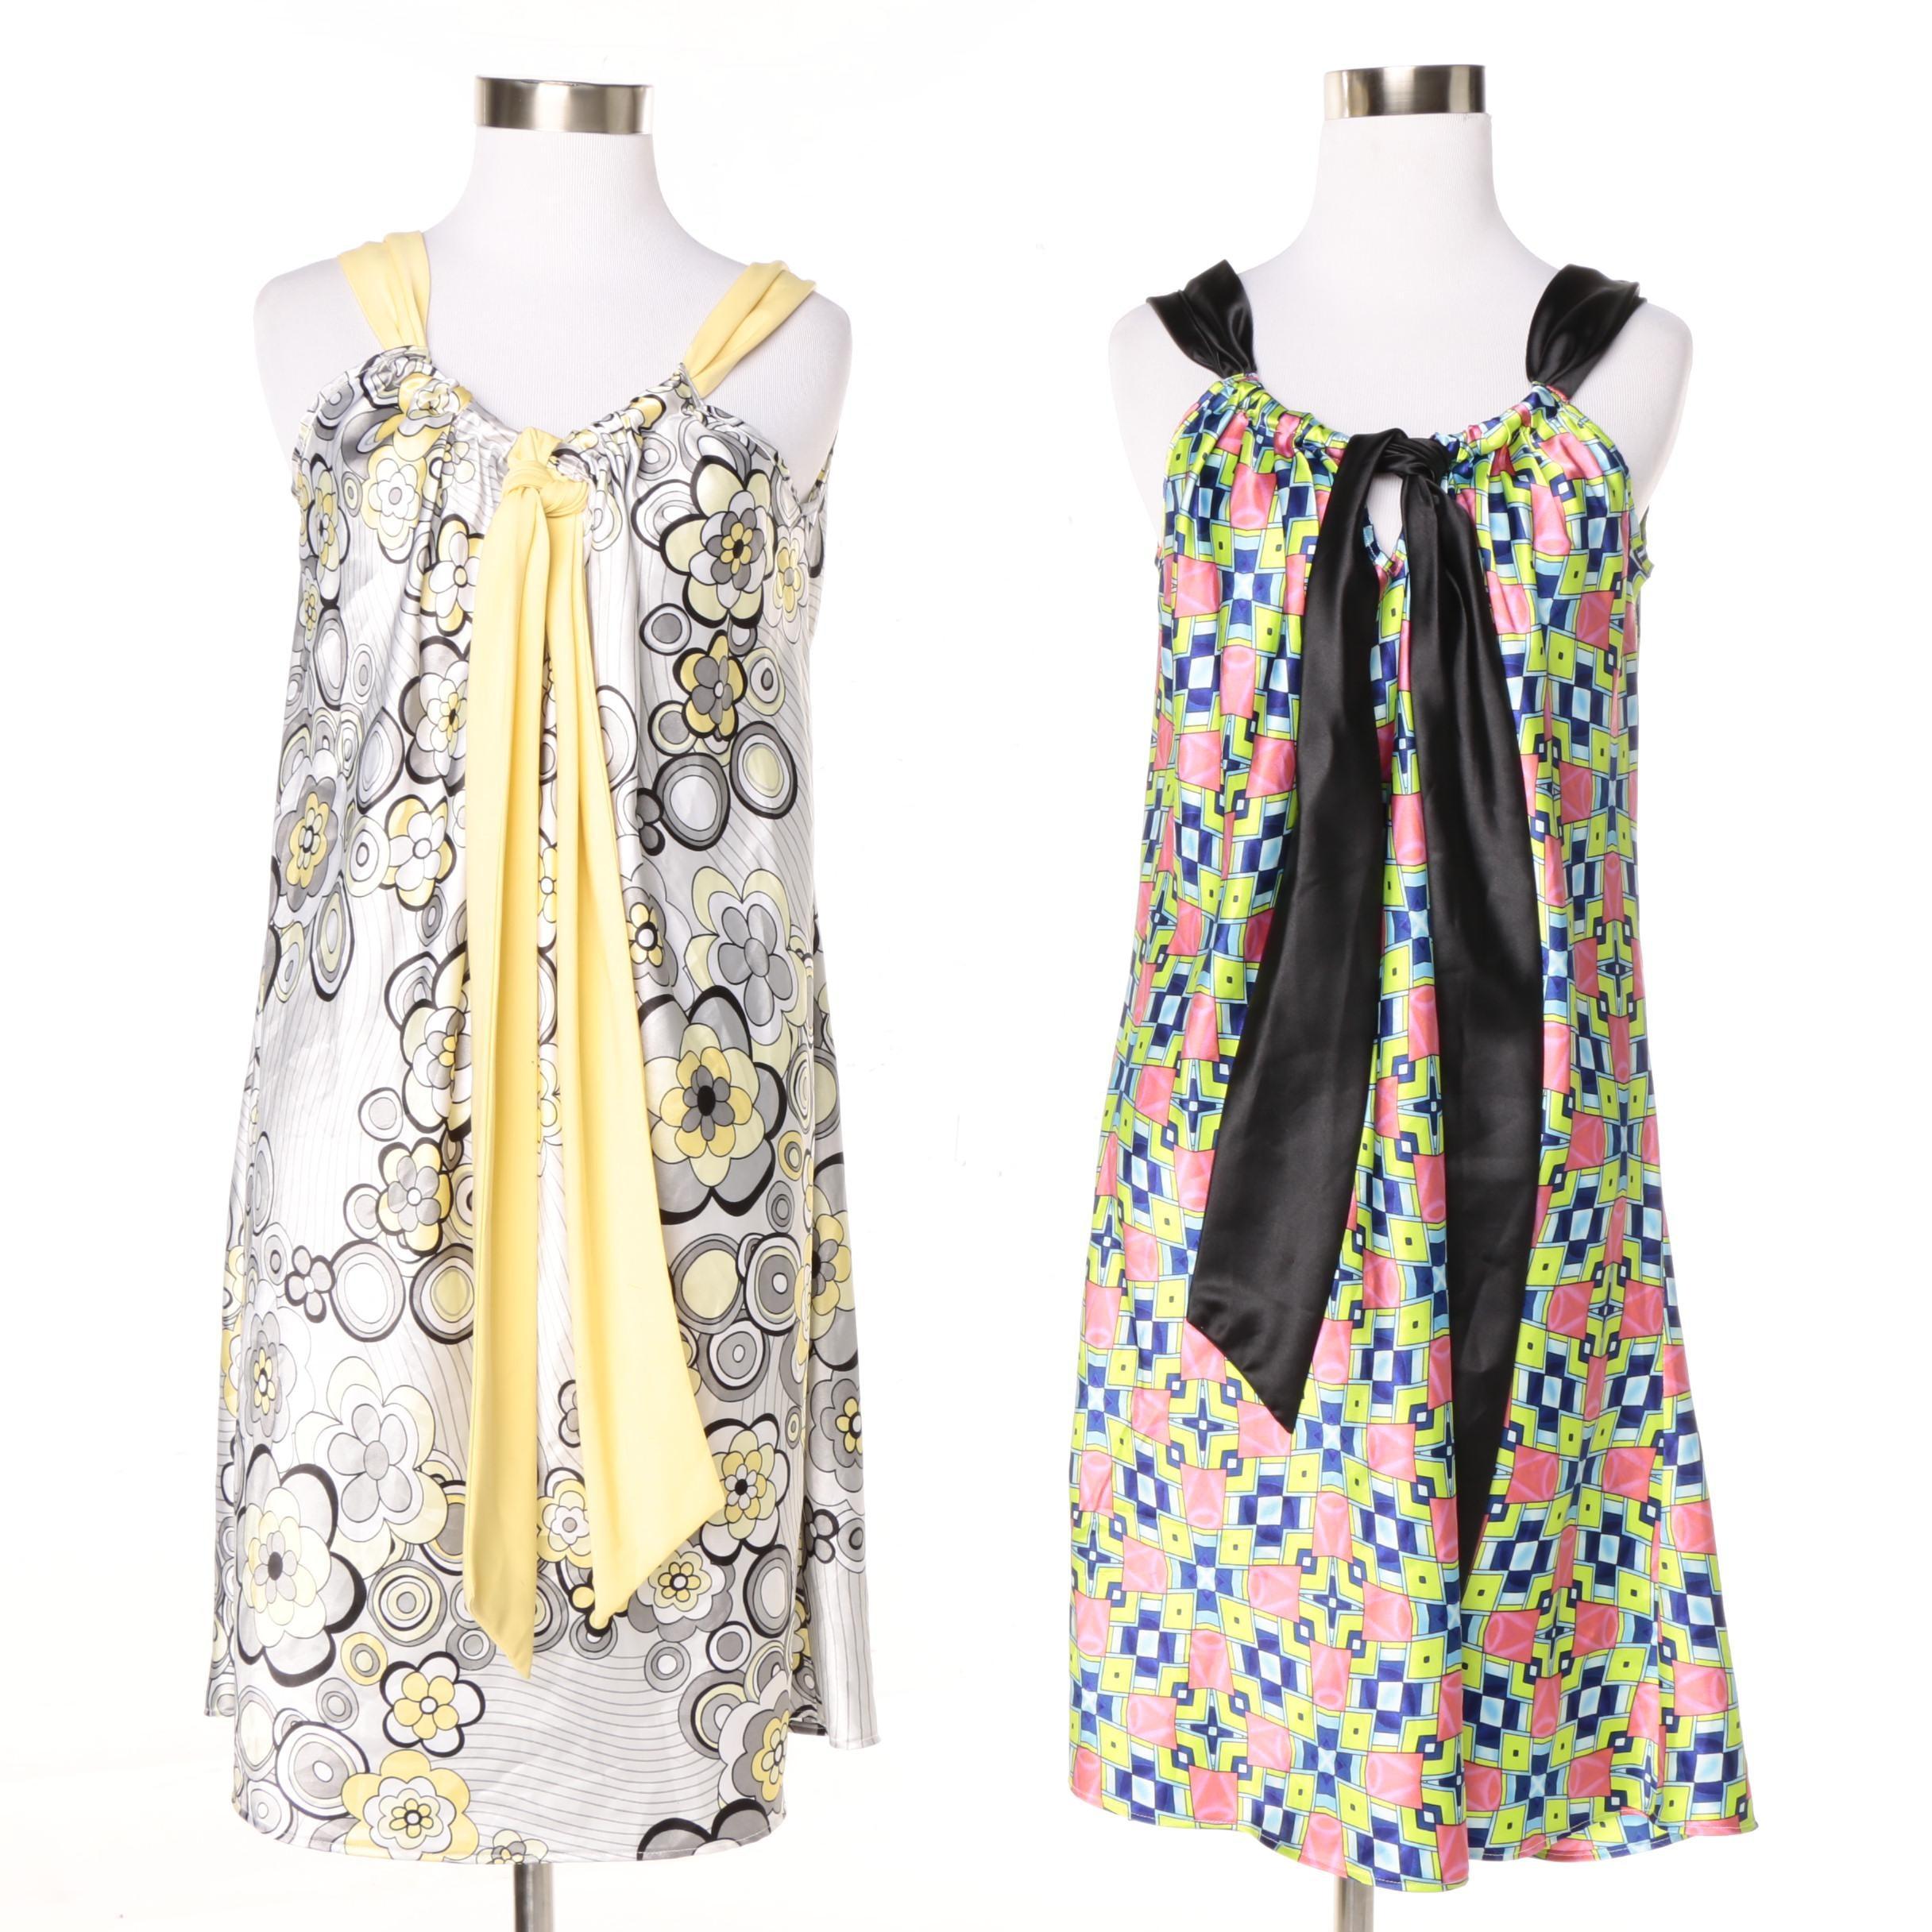 Jimmy Star Sleeveless Dresses